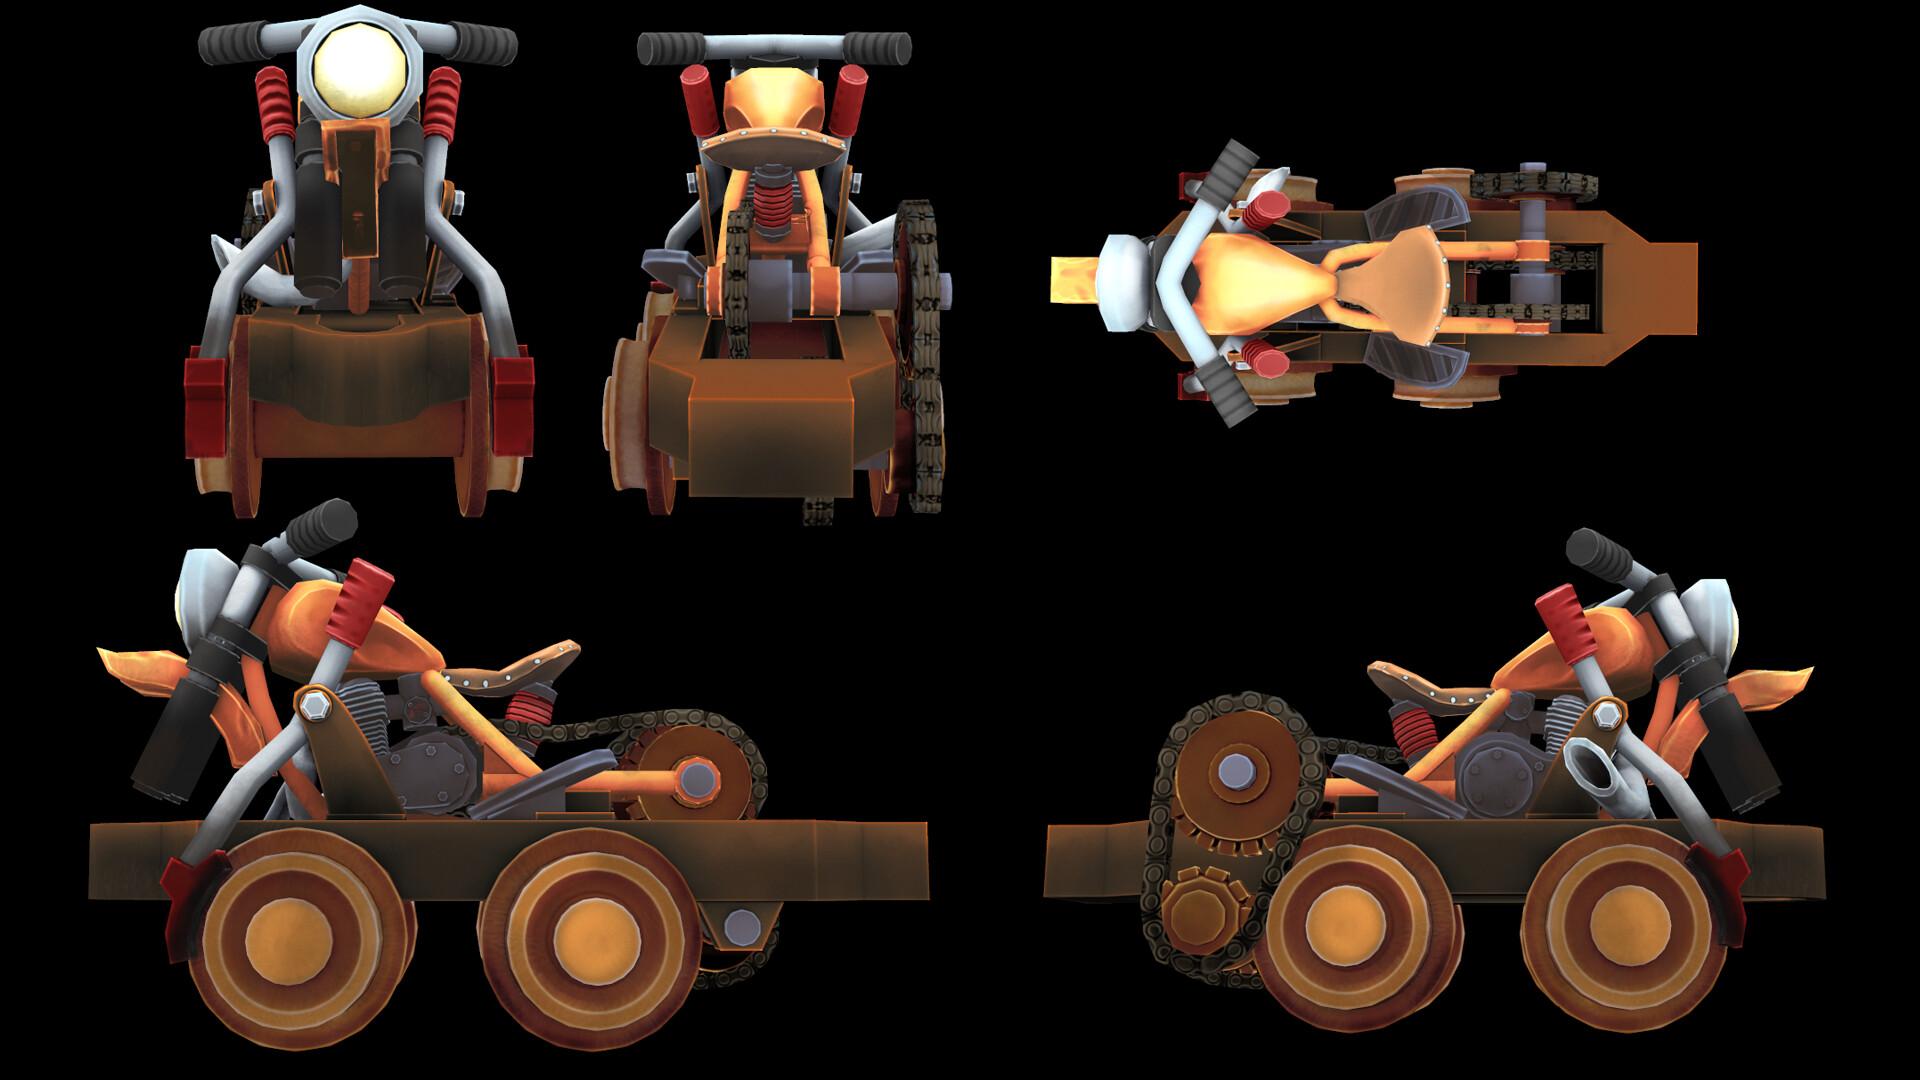 Matt clarke motorcycleminecart04